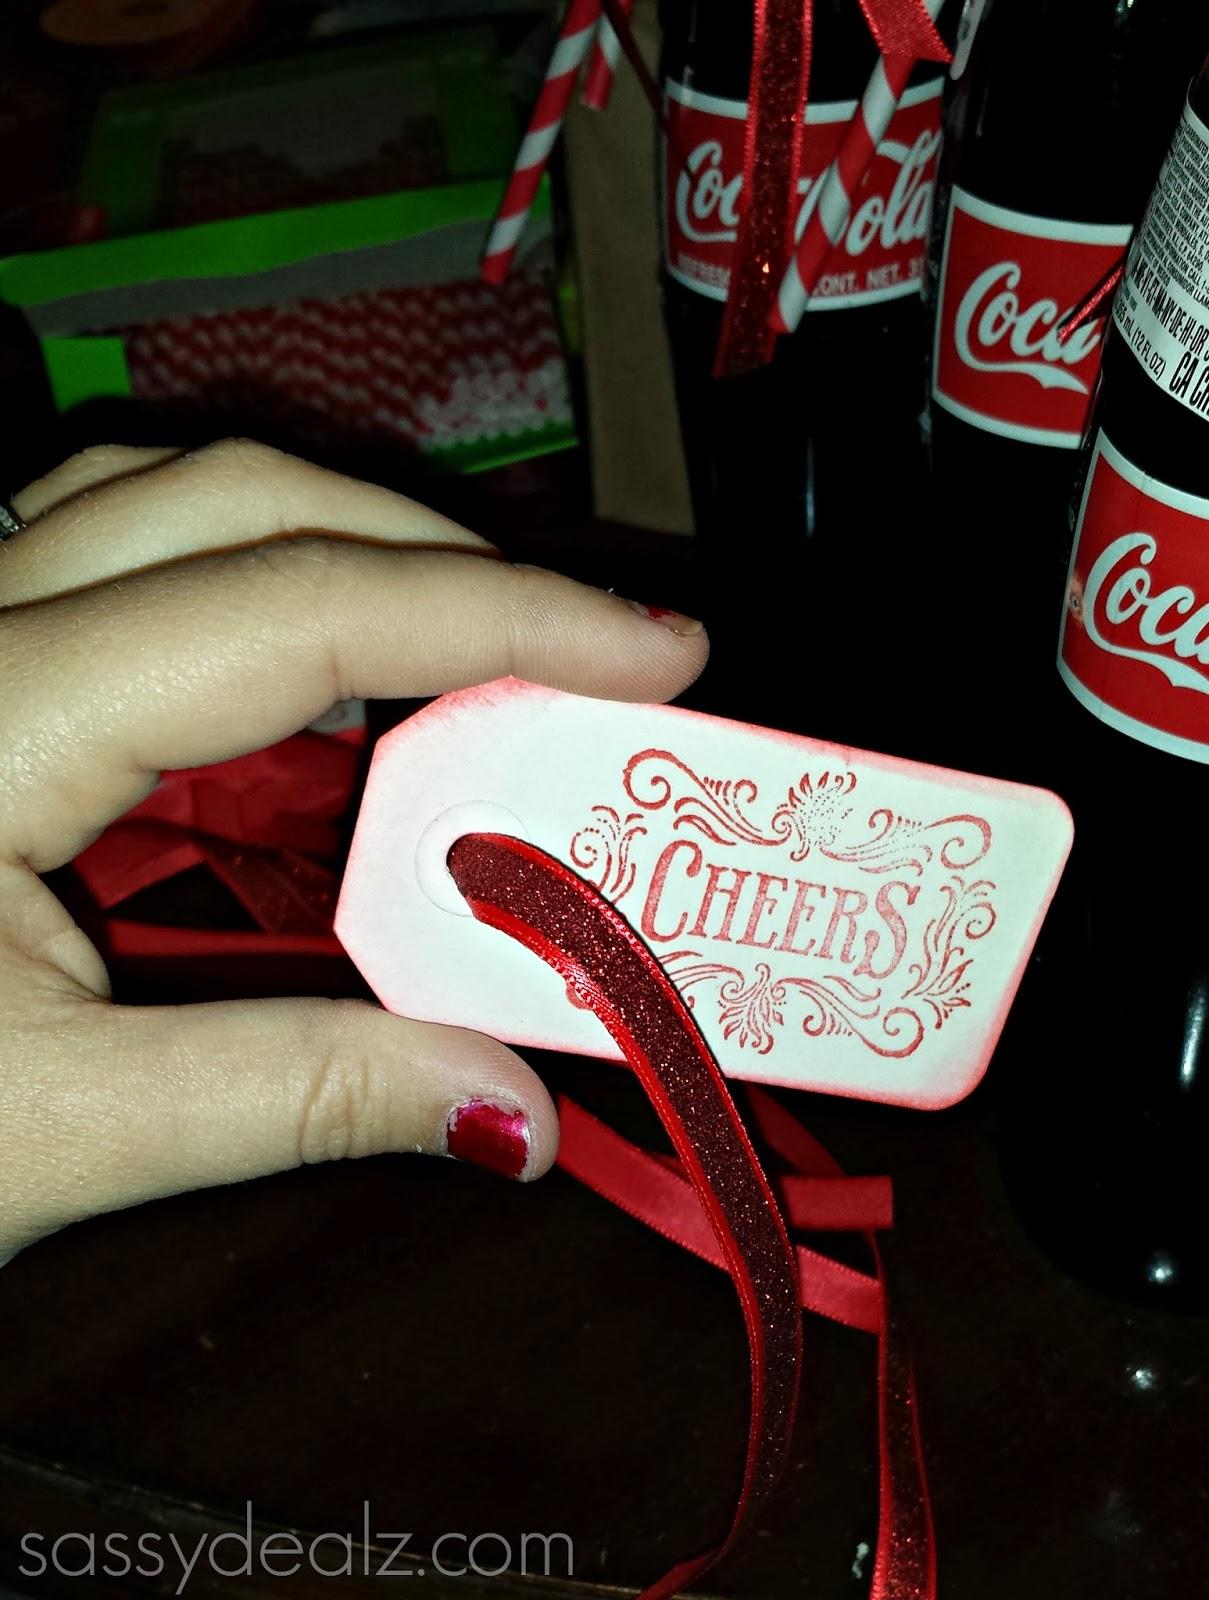 diy coke bottle label wedding favors